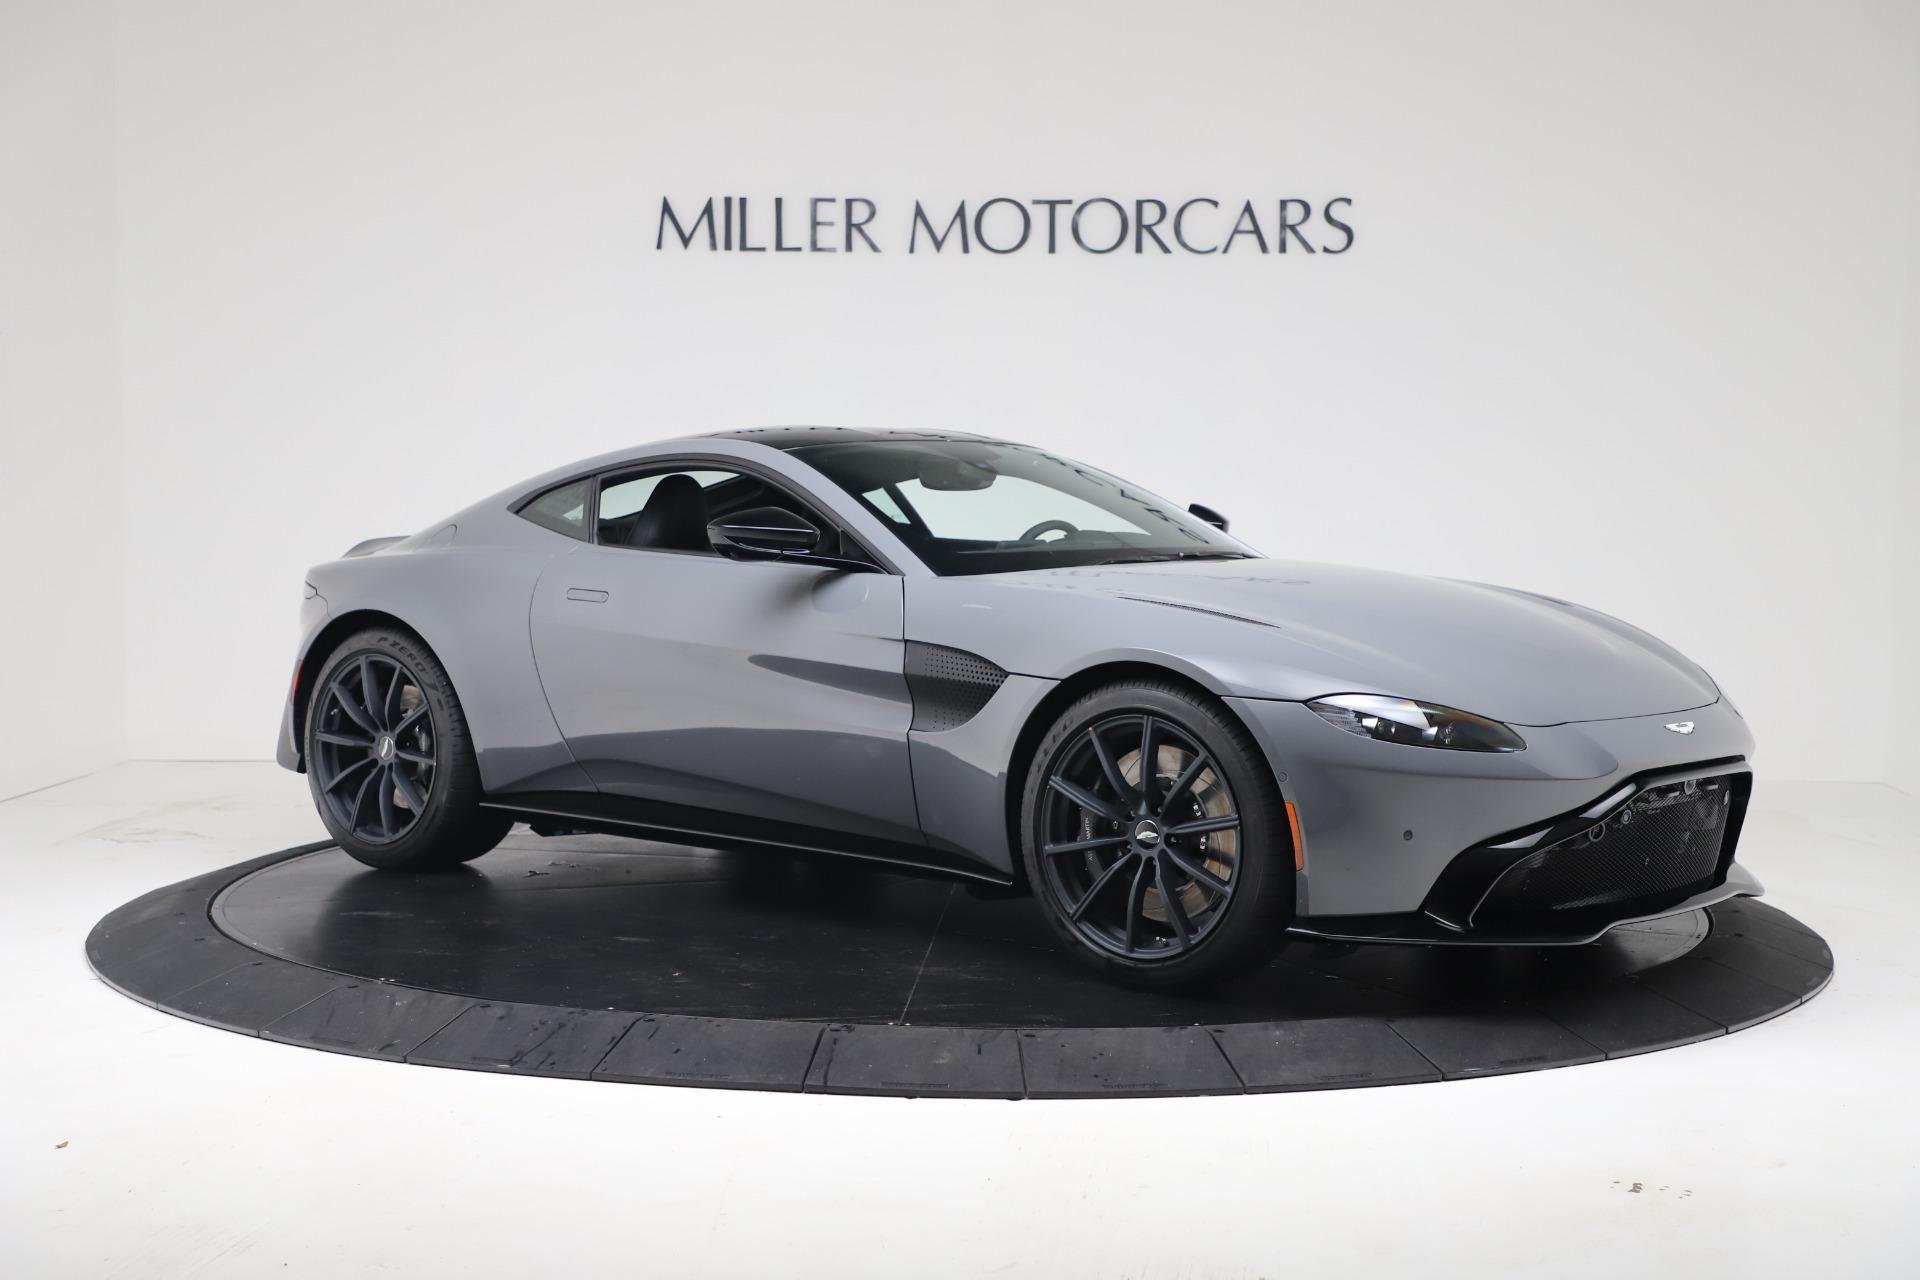 New 2020 Aston Martin Vantage V8 For Sale 189139 In Greenwich, CT